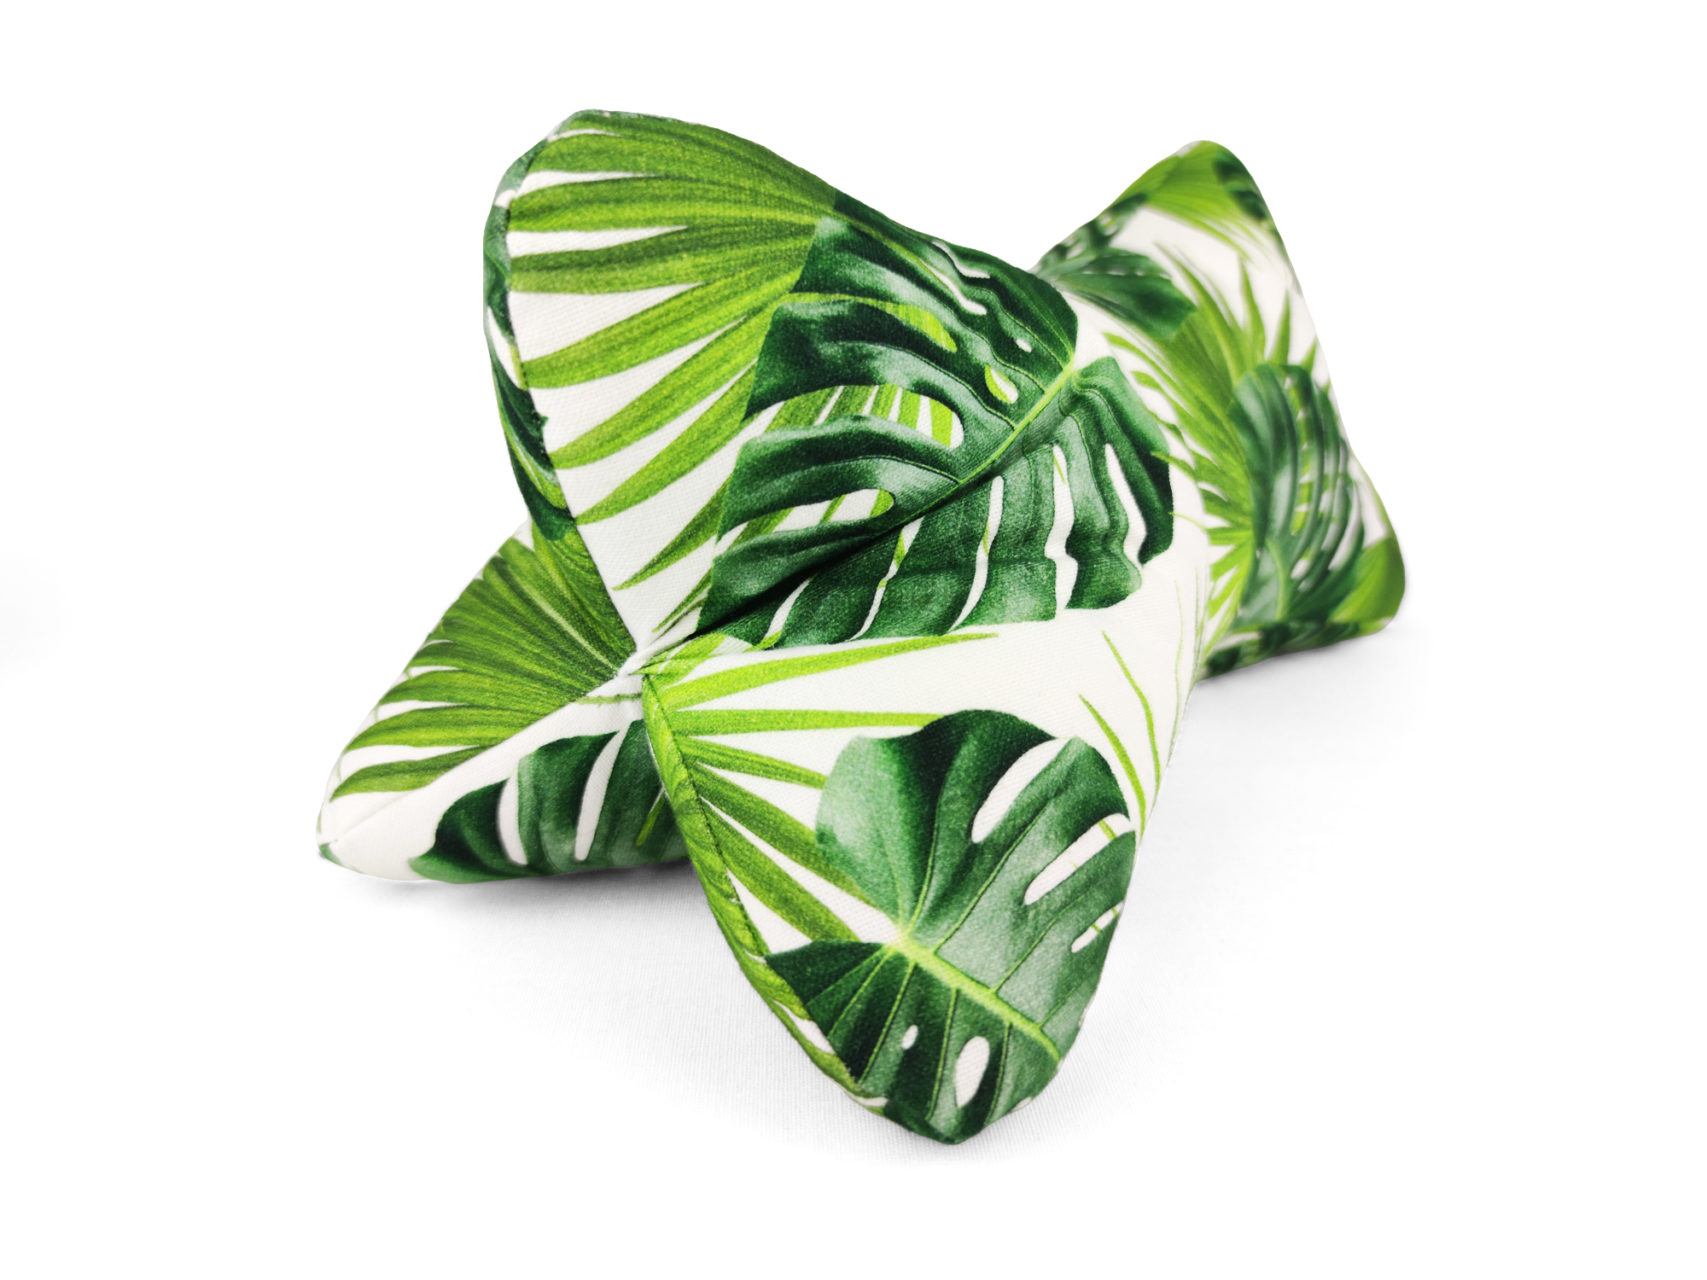 Leseknochen grüne Monstera Blätter Living green